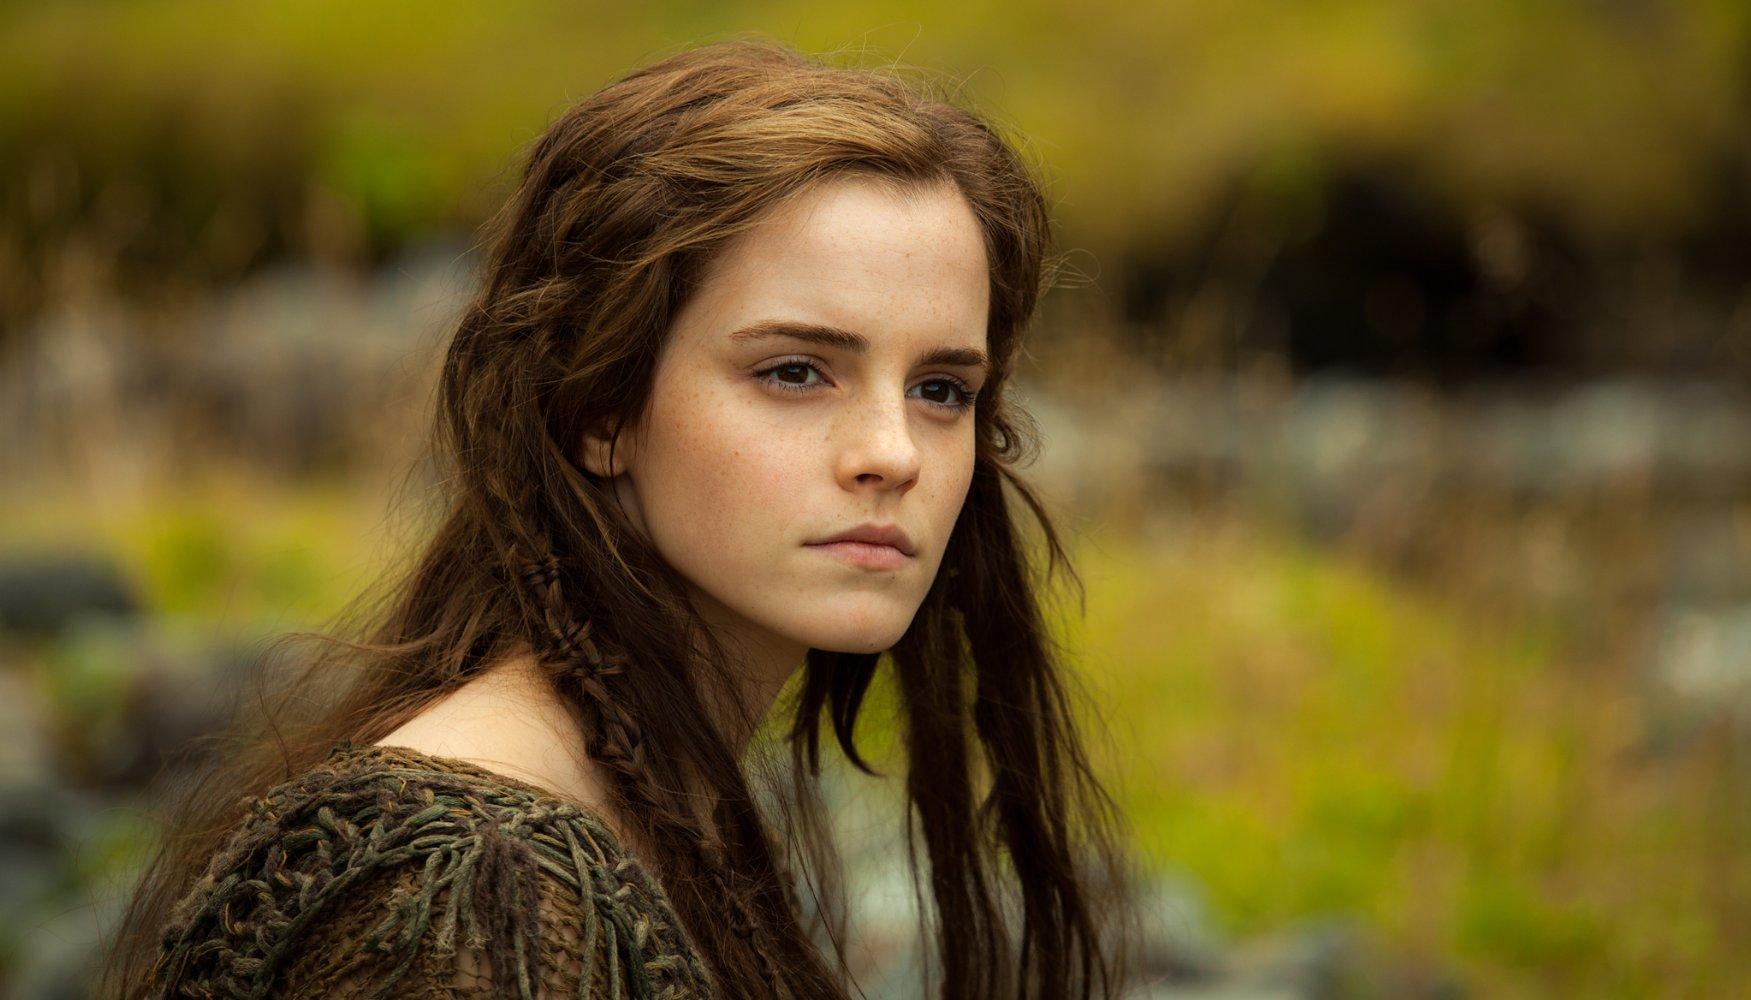 Kata-Kata Bijak Emma Watson yang Penuh Makna